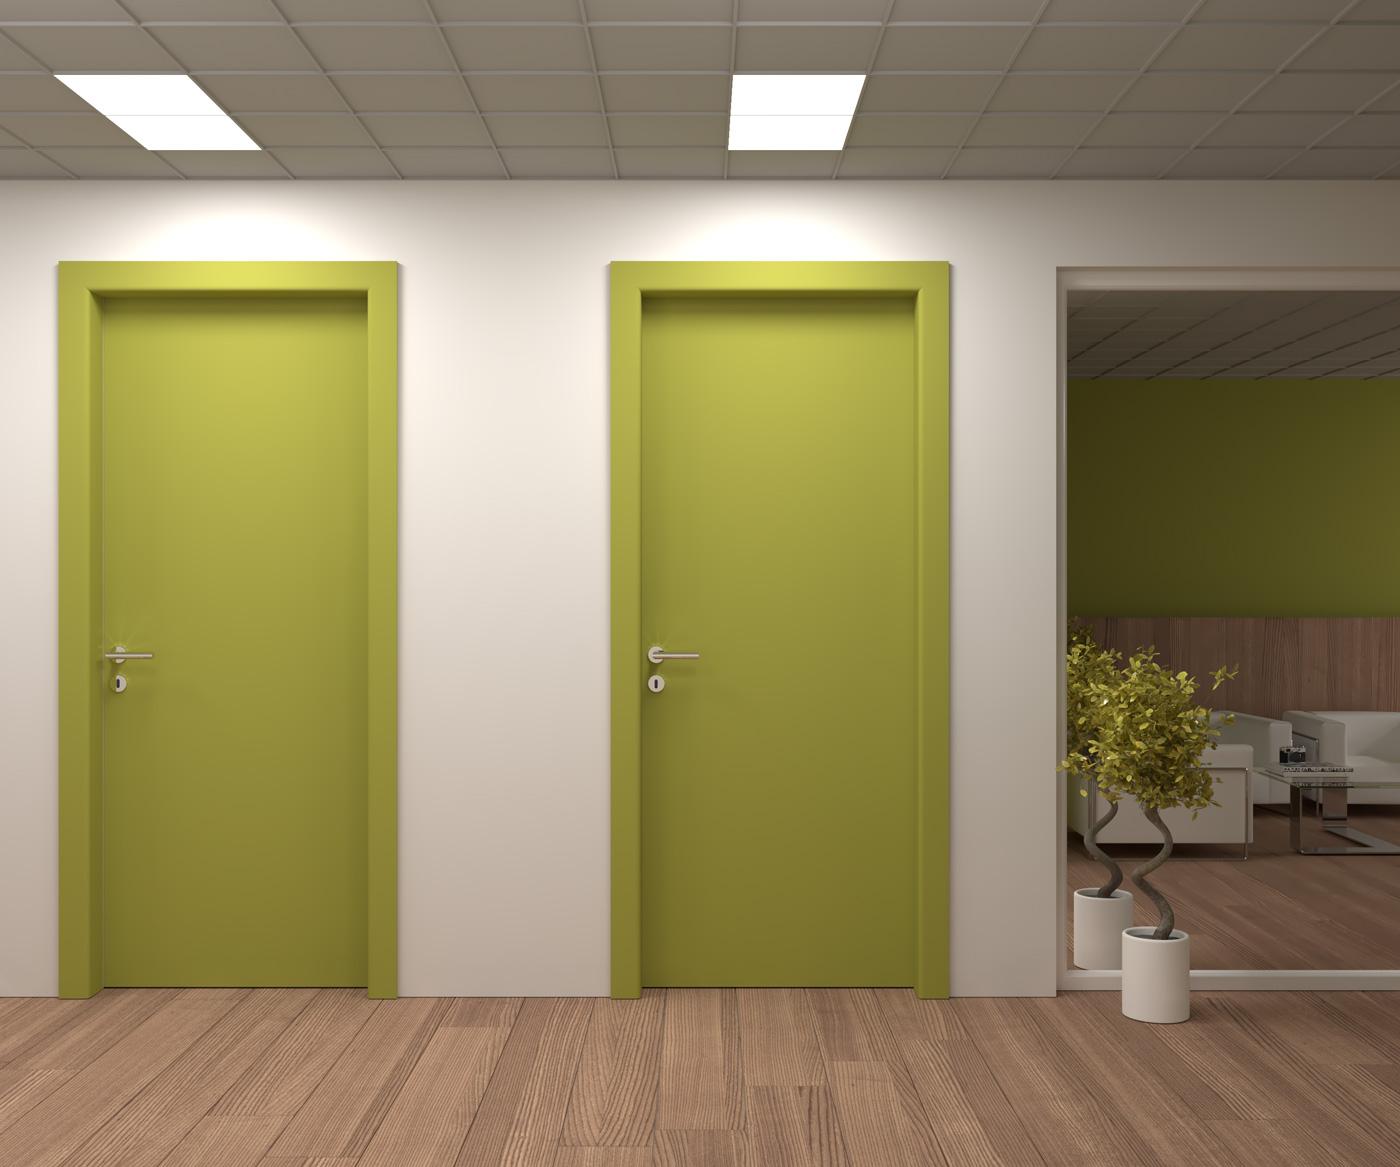 Porte fonoassorbenti,porte fonoisolanti, Porte fonoassorbenti